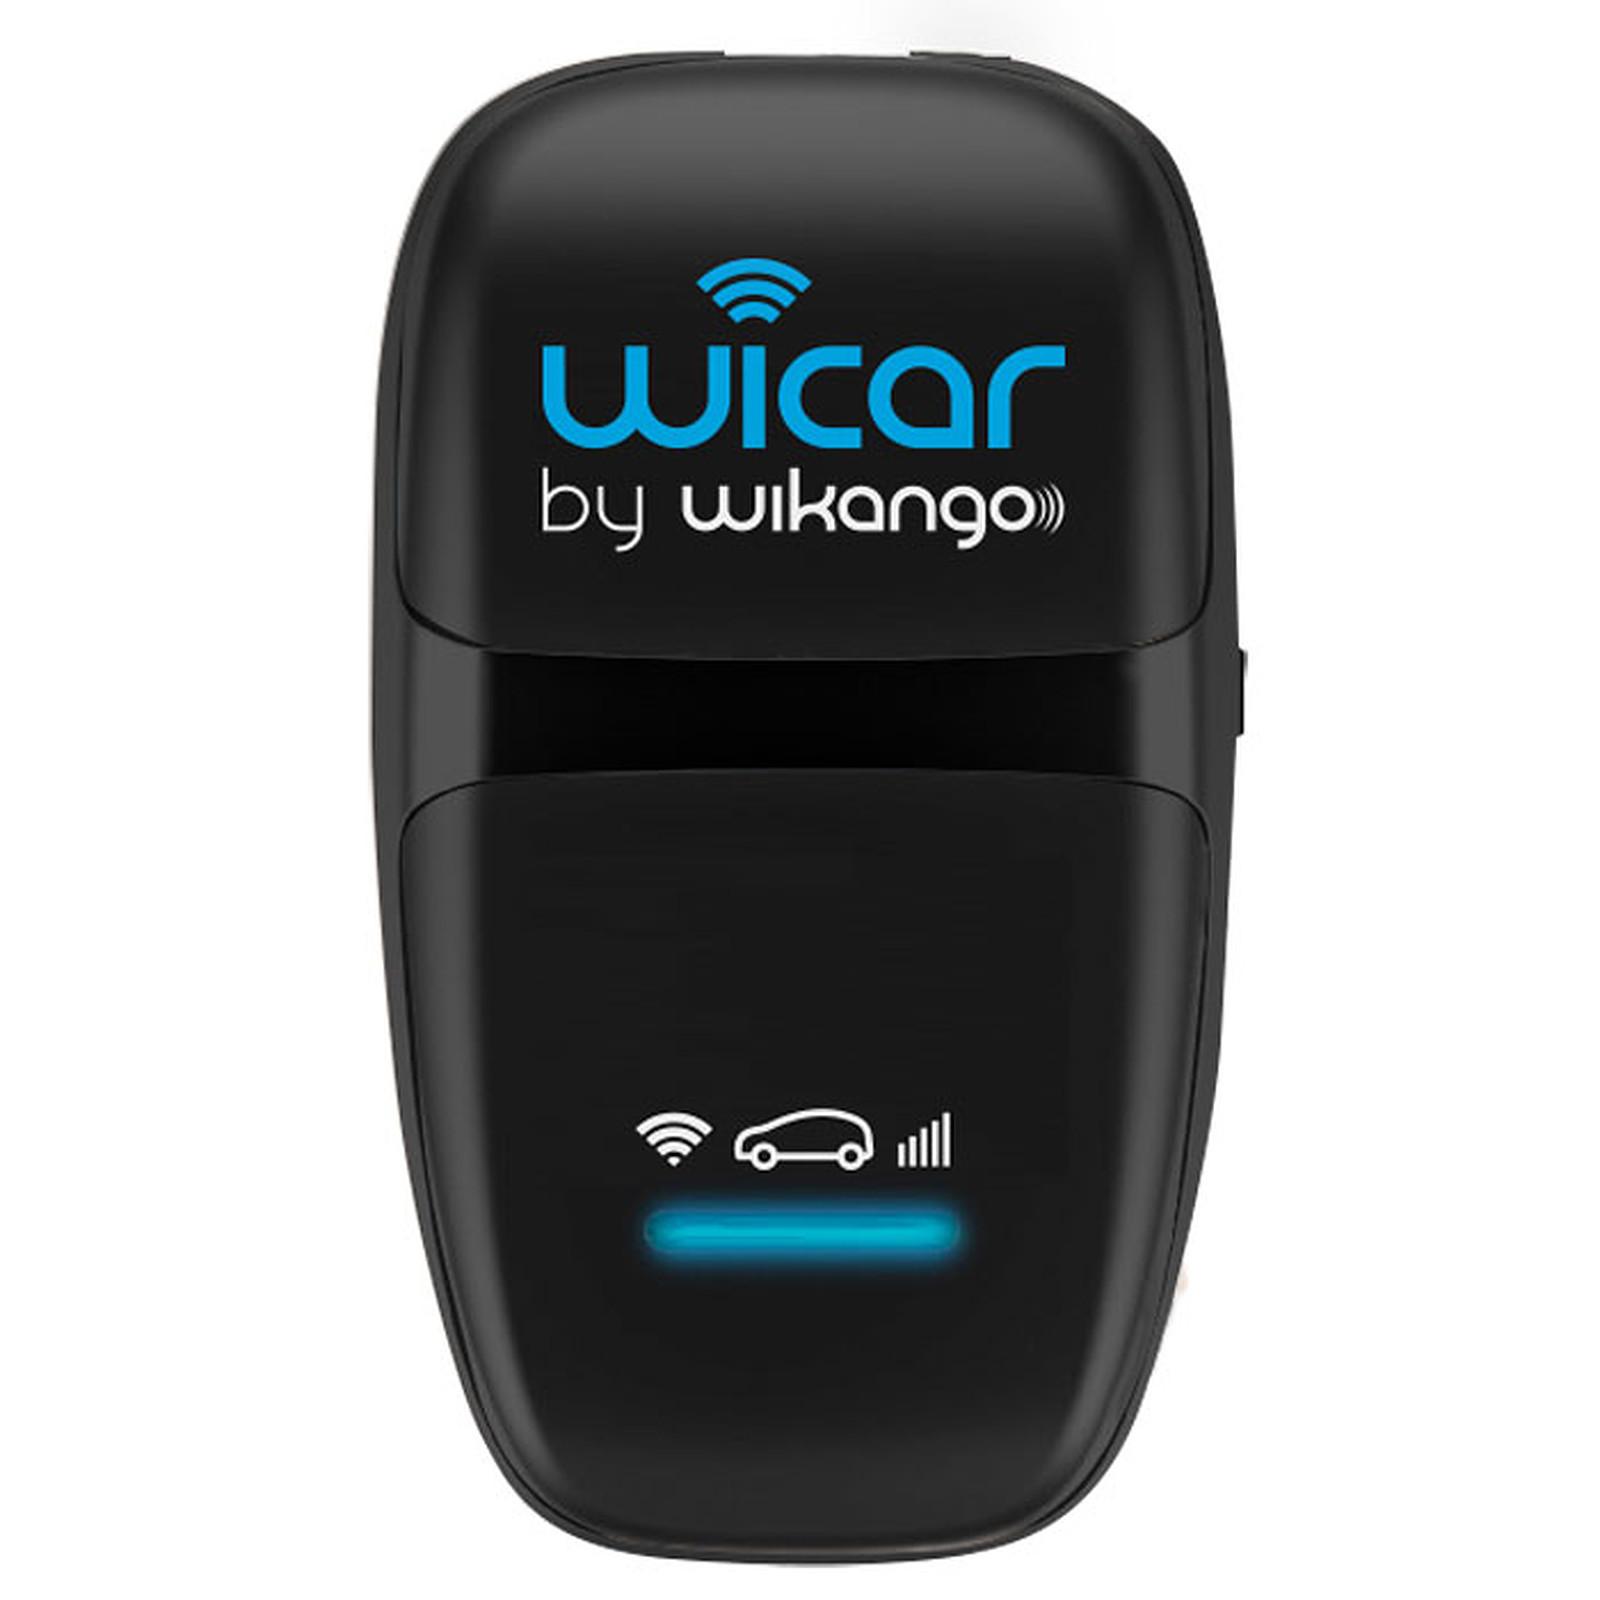 Wikango WiCar